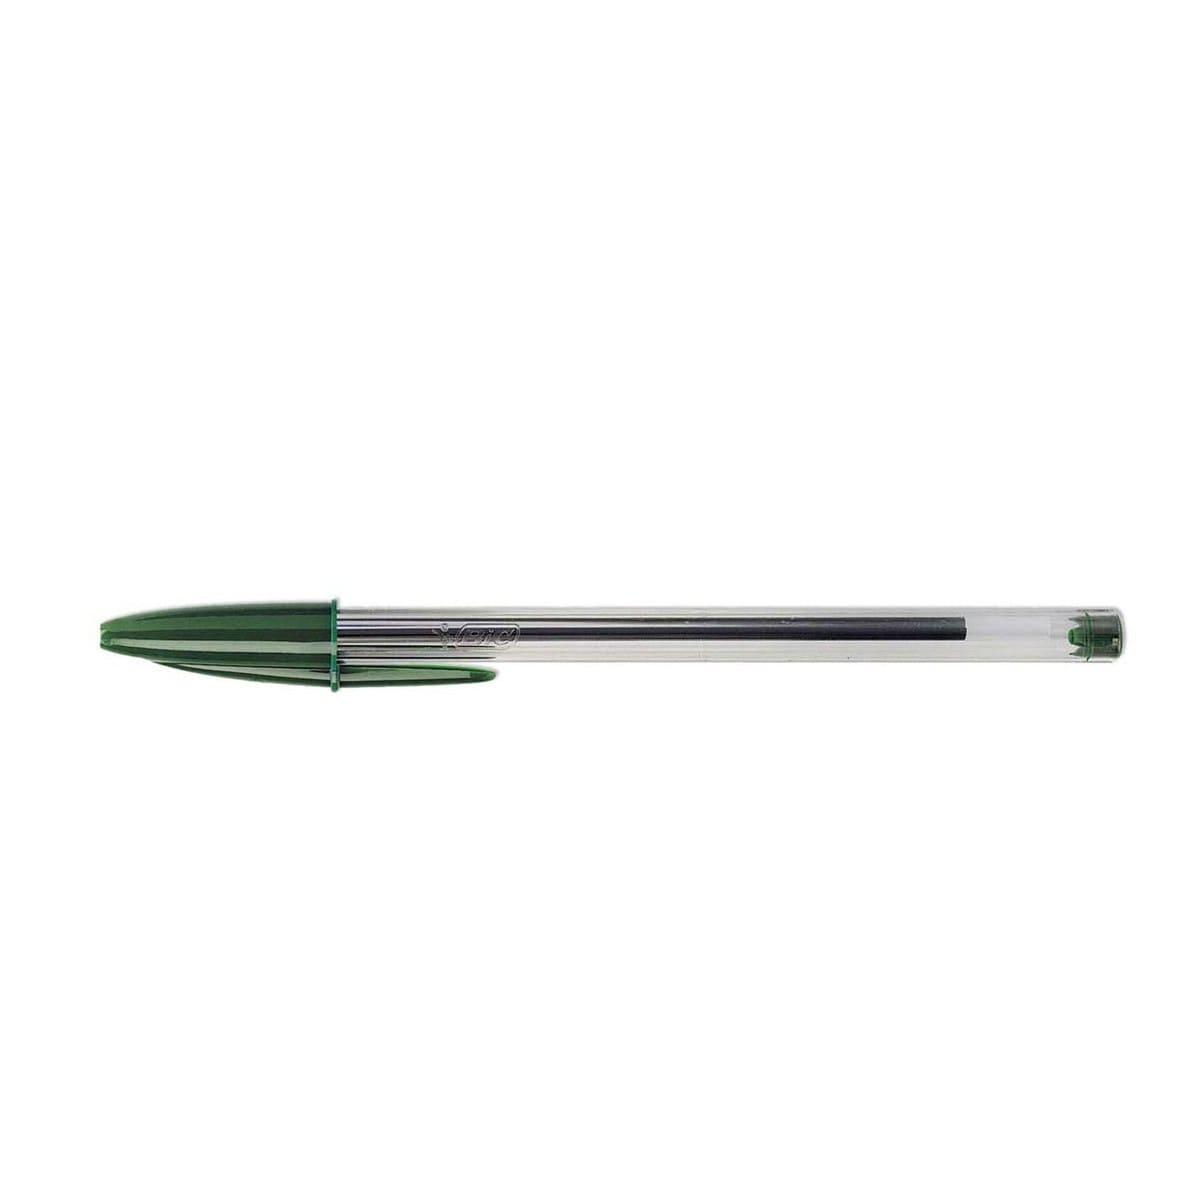 Caneta Esferográfica 1.0 Cristal Verde Bic